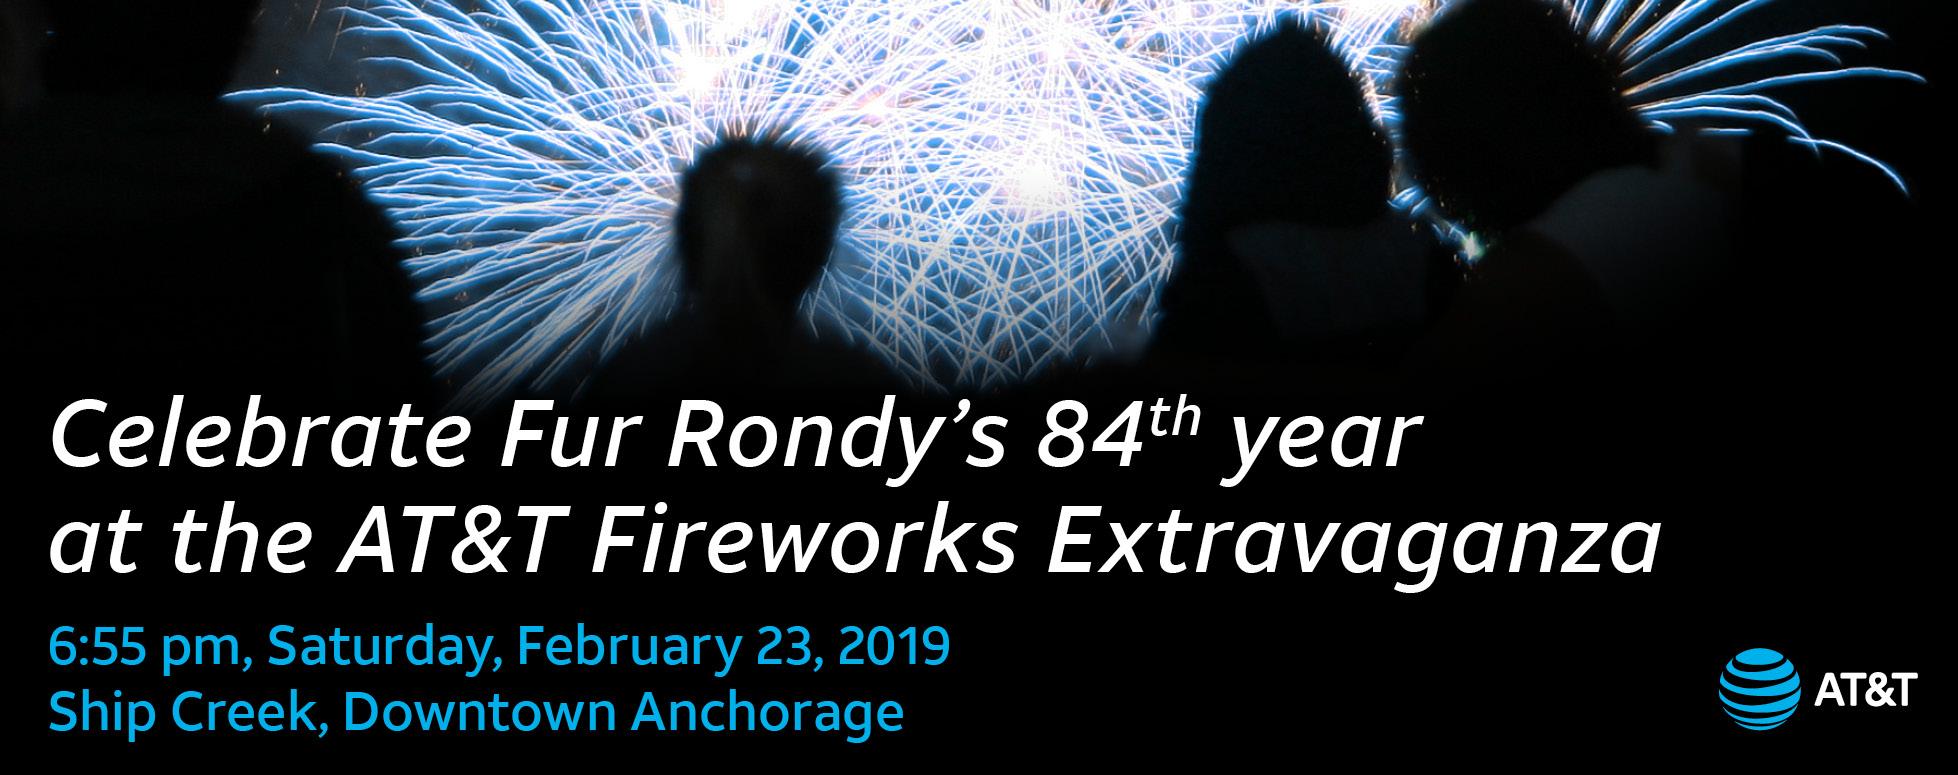 2019 Fur Rondy